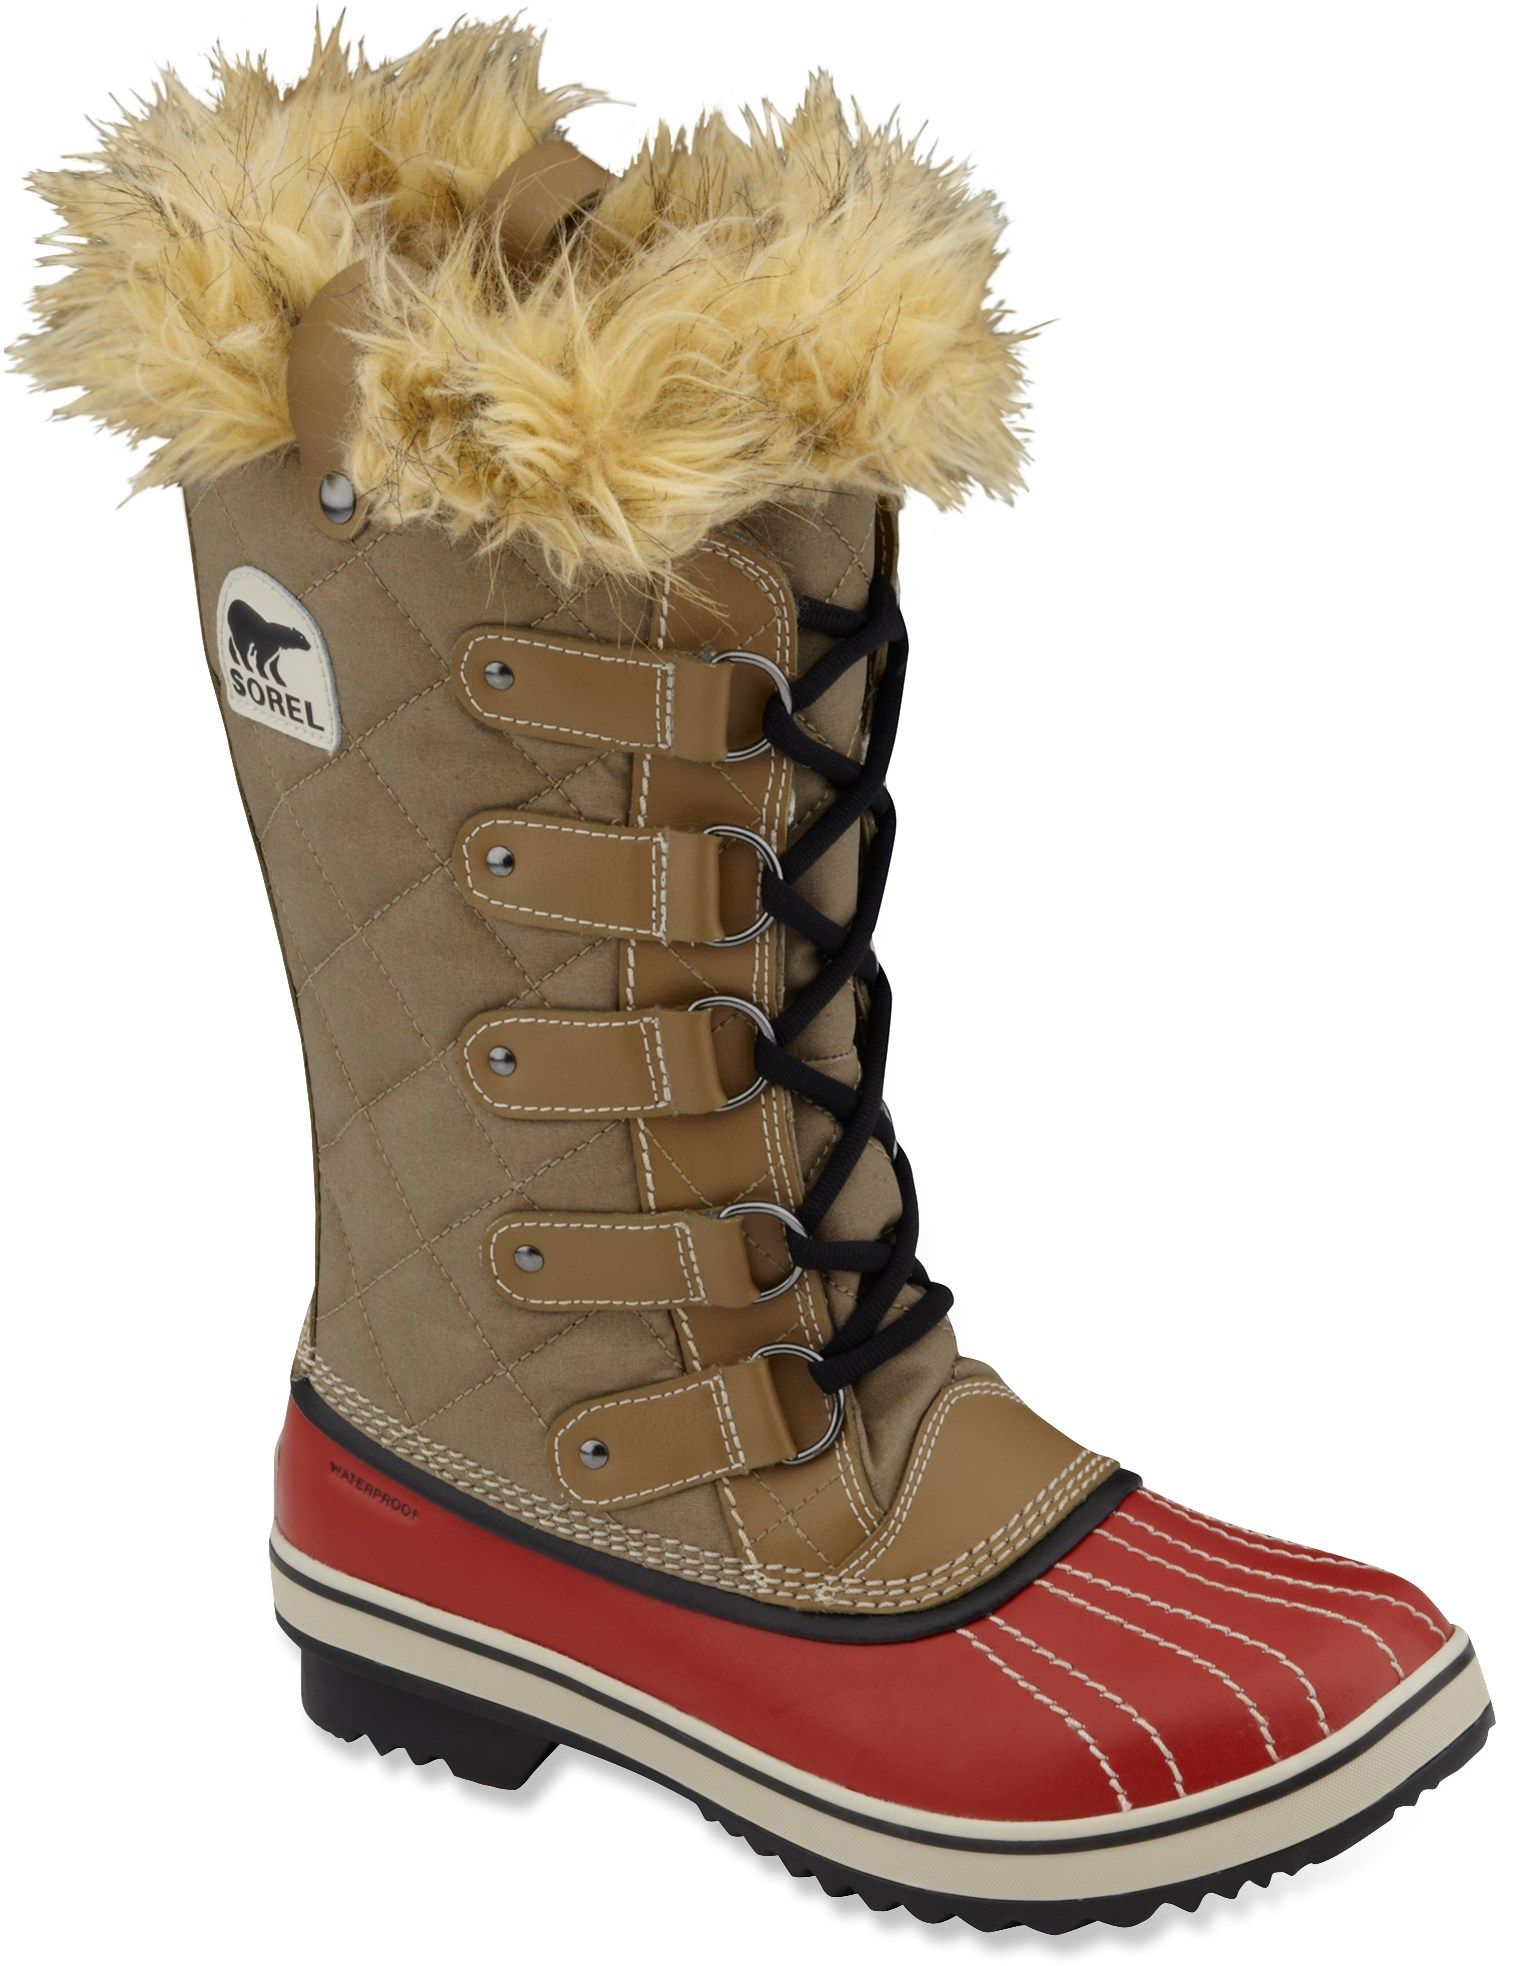 Sorel Tofino Winter Boots - Women's - Free Shipping at REI.com